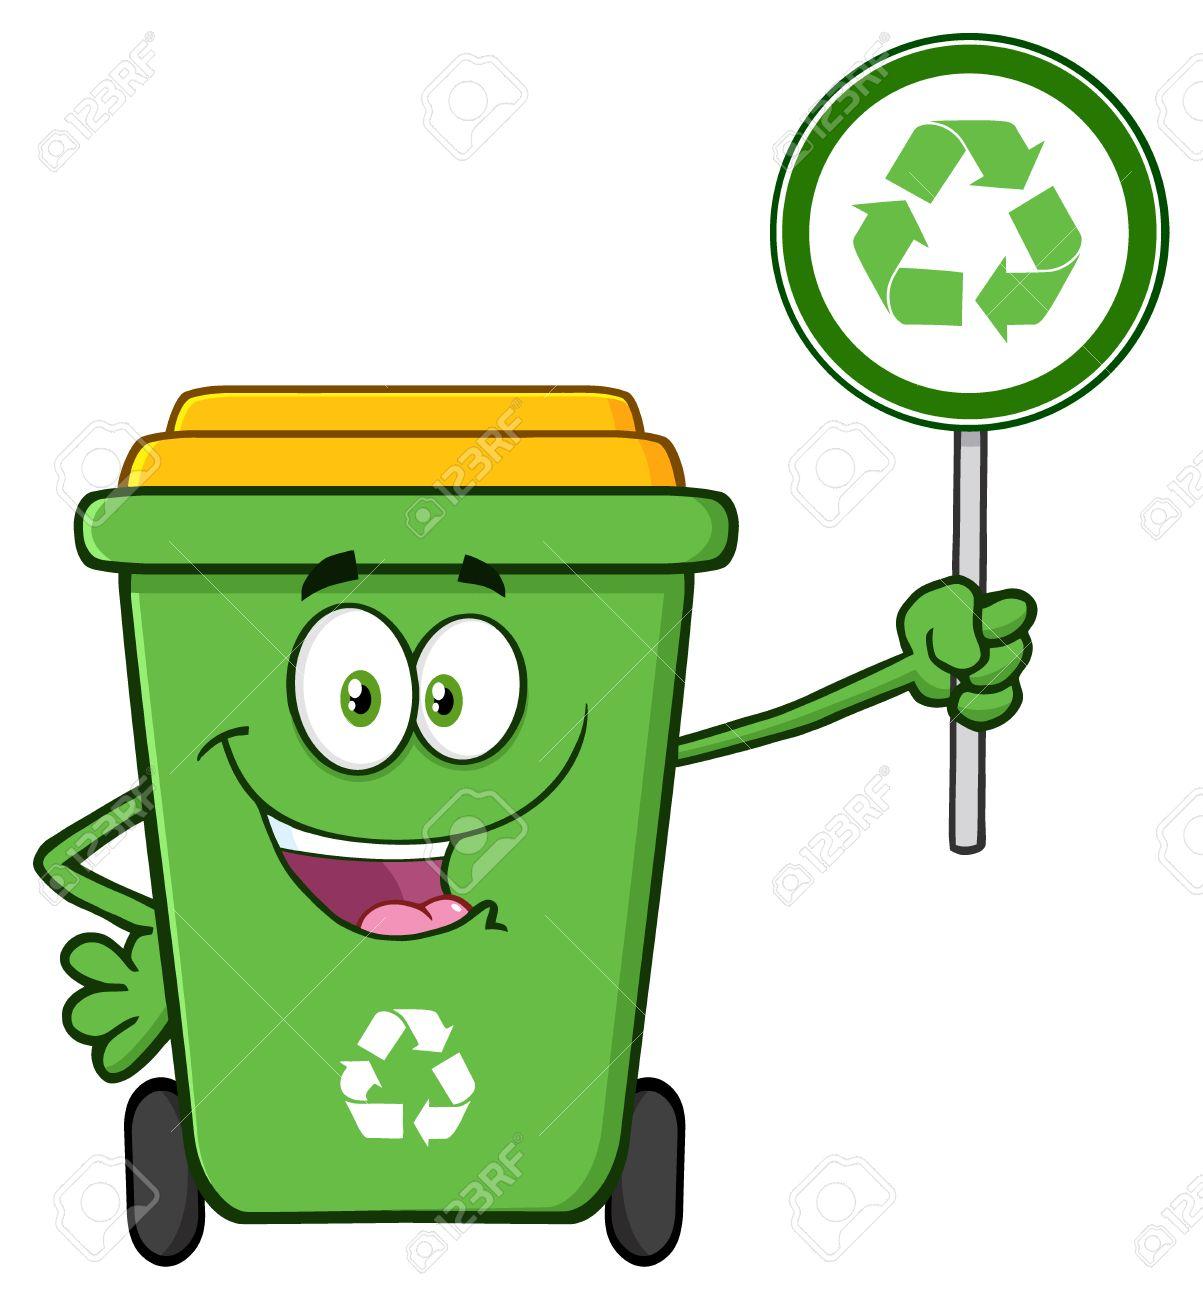 1203x1300 Cute Green Recycle Bin Cartoon Mascot Character Holding A Recycle